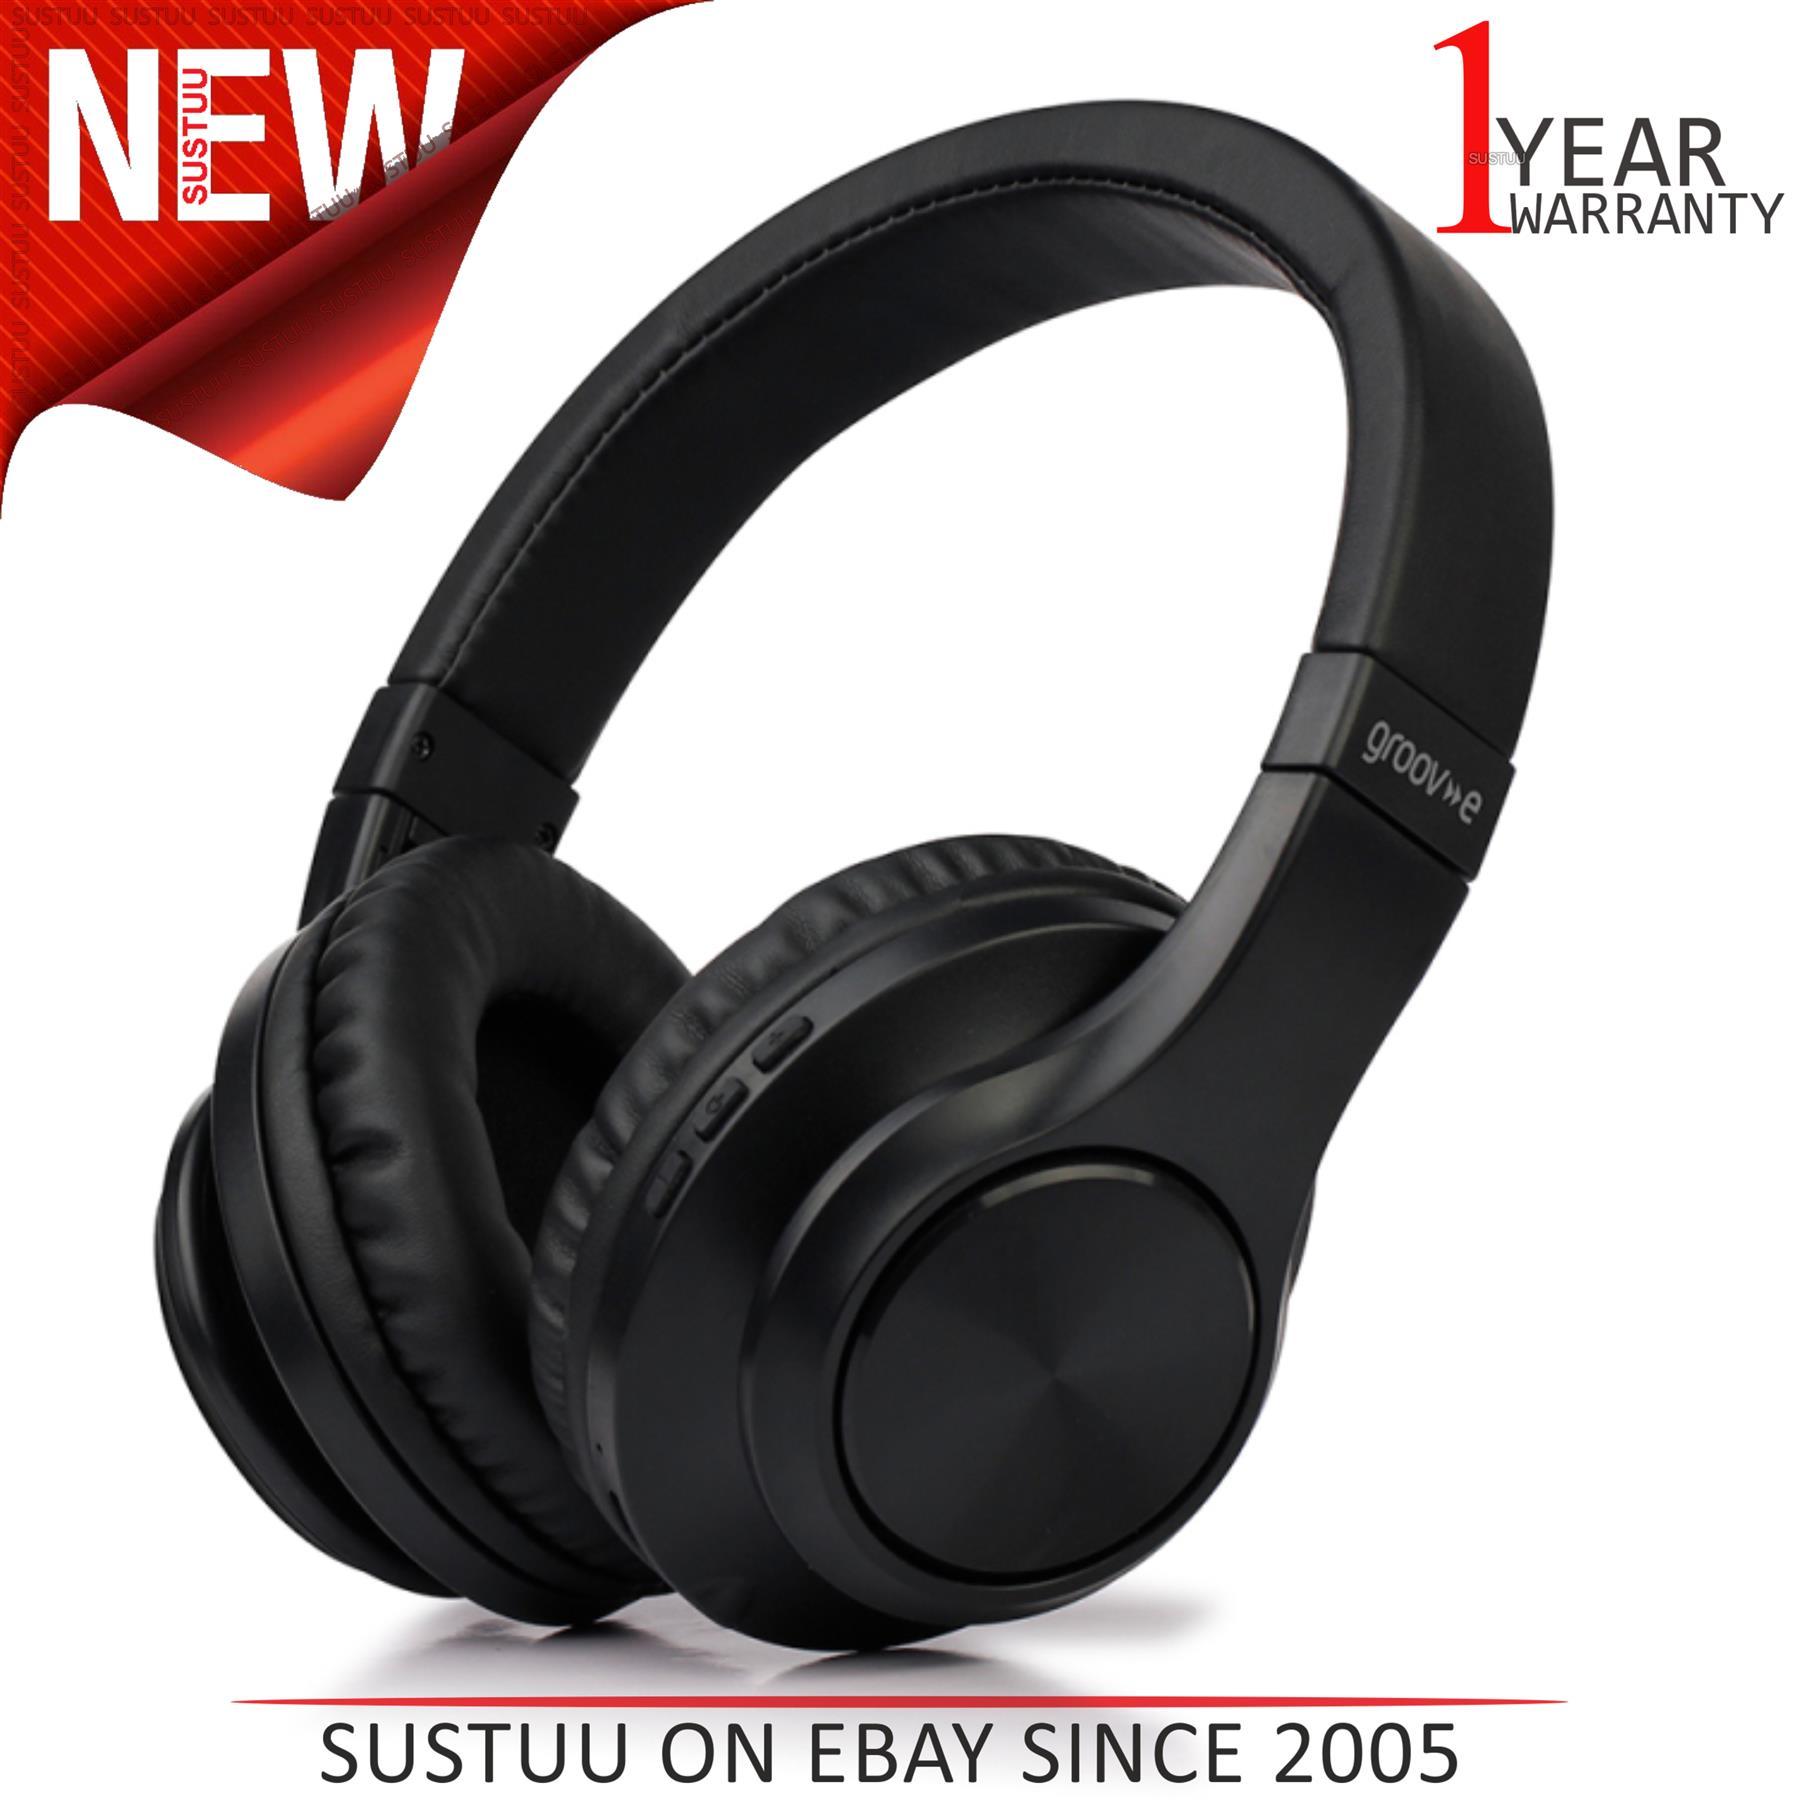 Groov E Bt550 Rhythm Wireless Bluetooth Stereo Headphones Folding Design Black Ebay